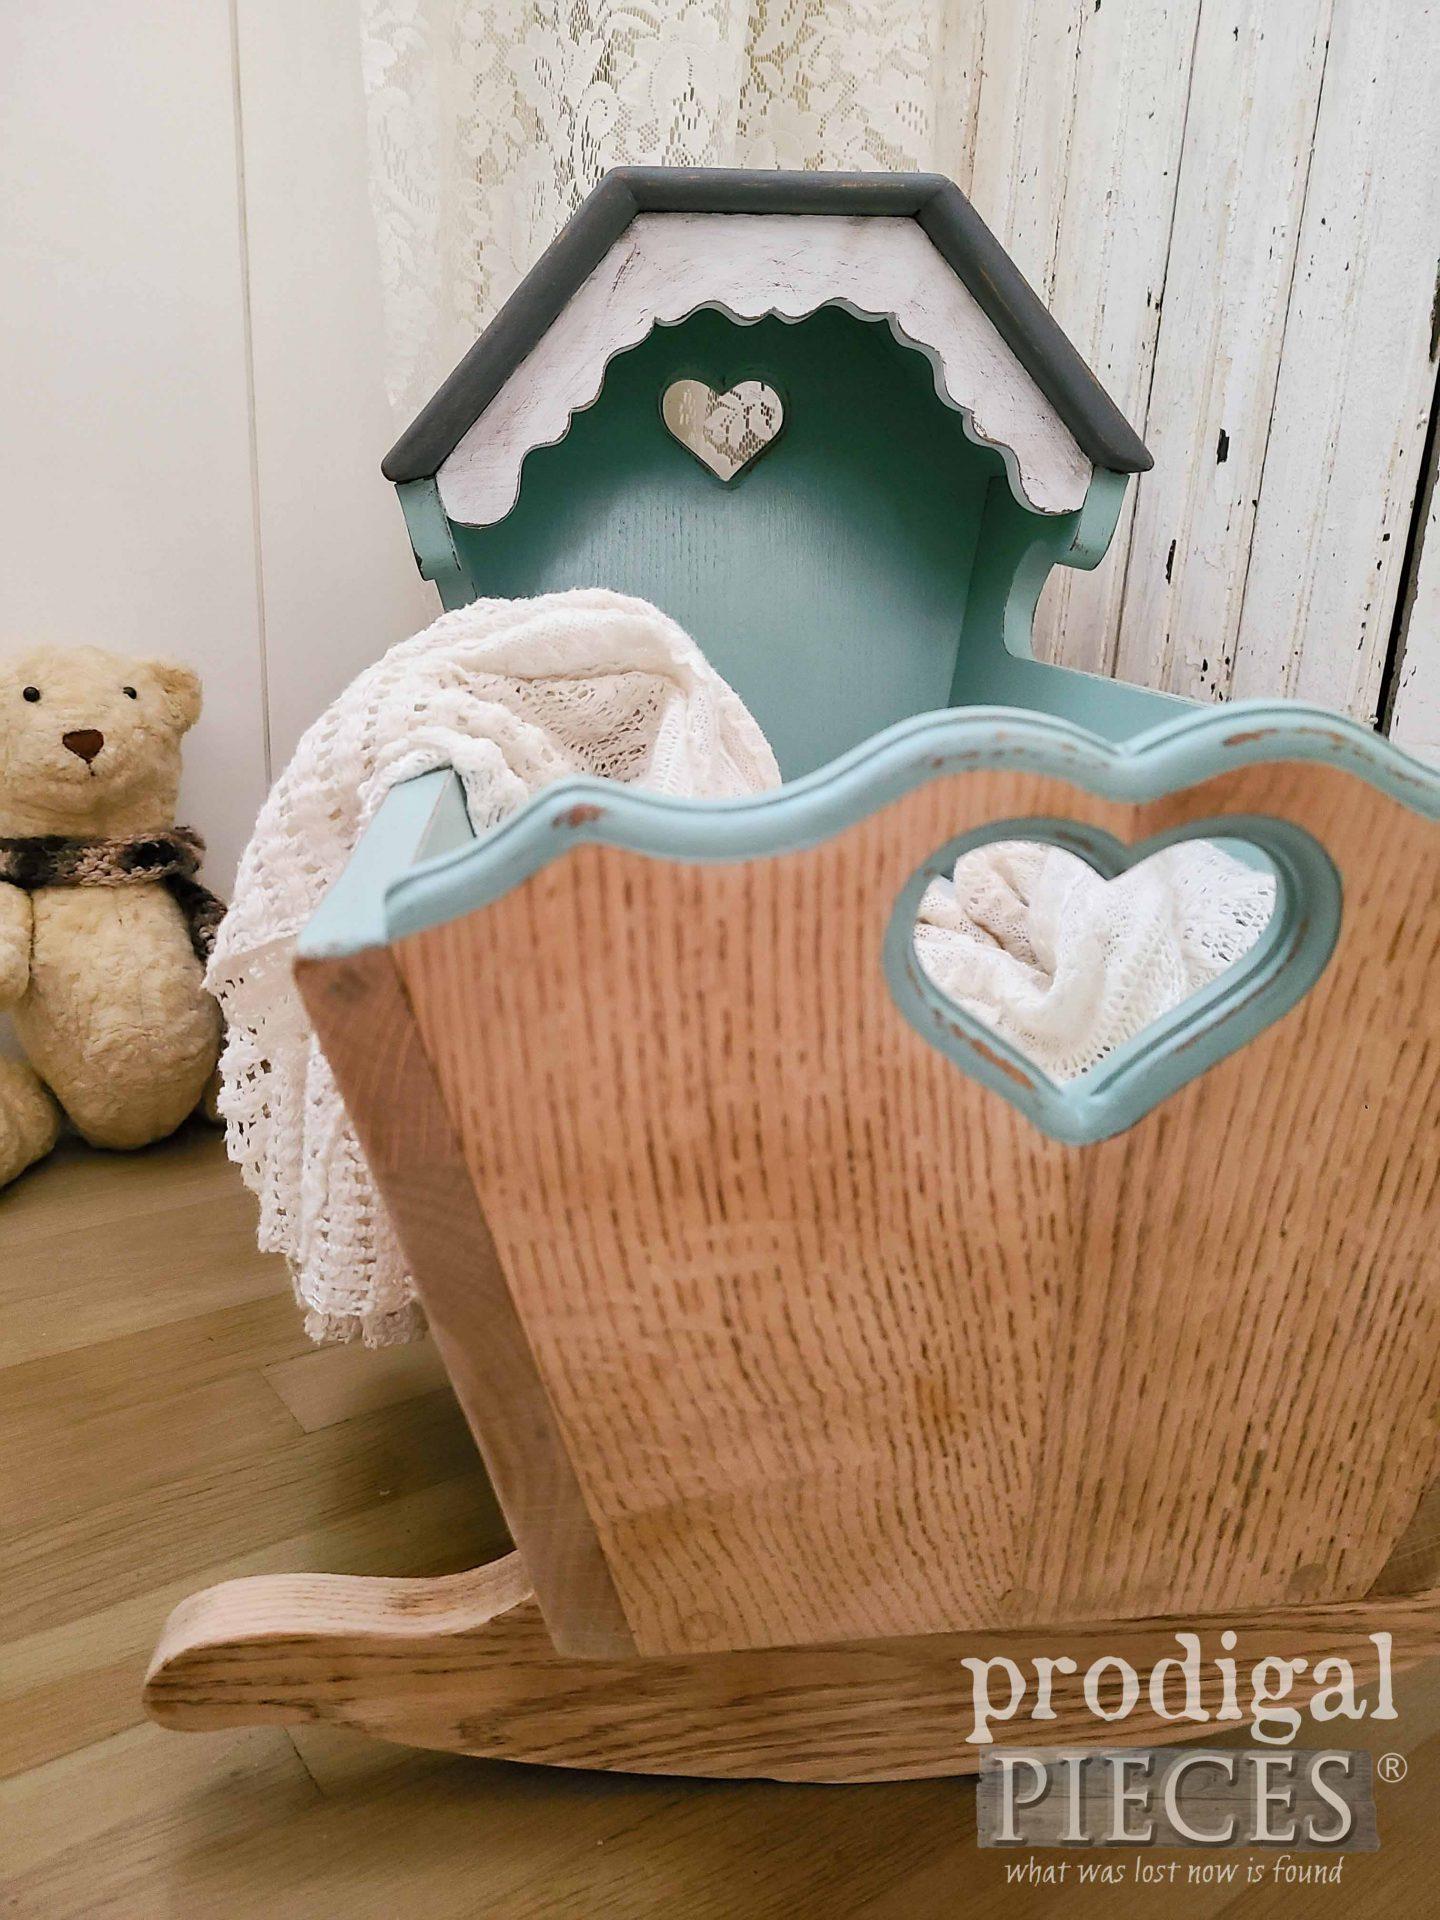 White Oak Baby Cradle Makeover by Larissa of Prodigal Pieces | prodigalpieces.com #prodigalpieces #baby #home #homedecor #diy